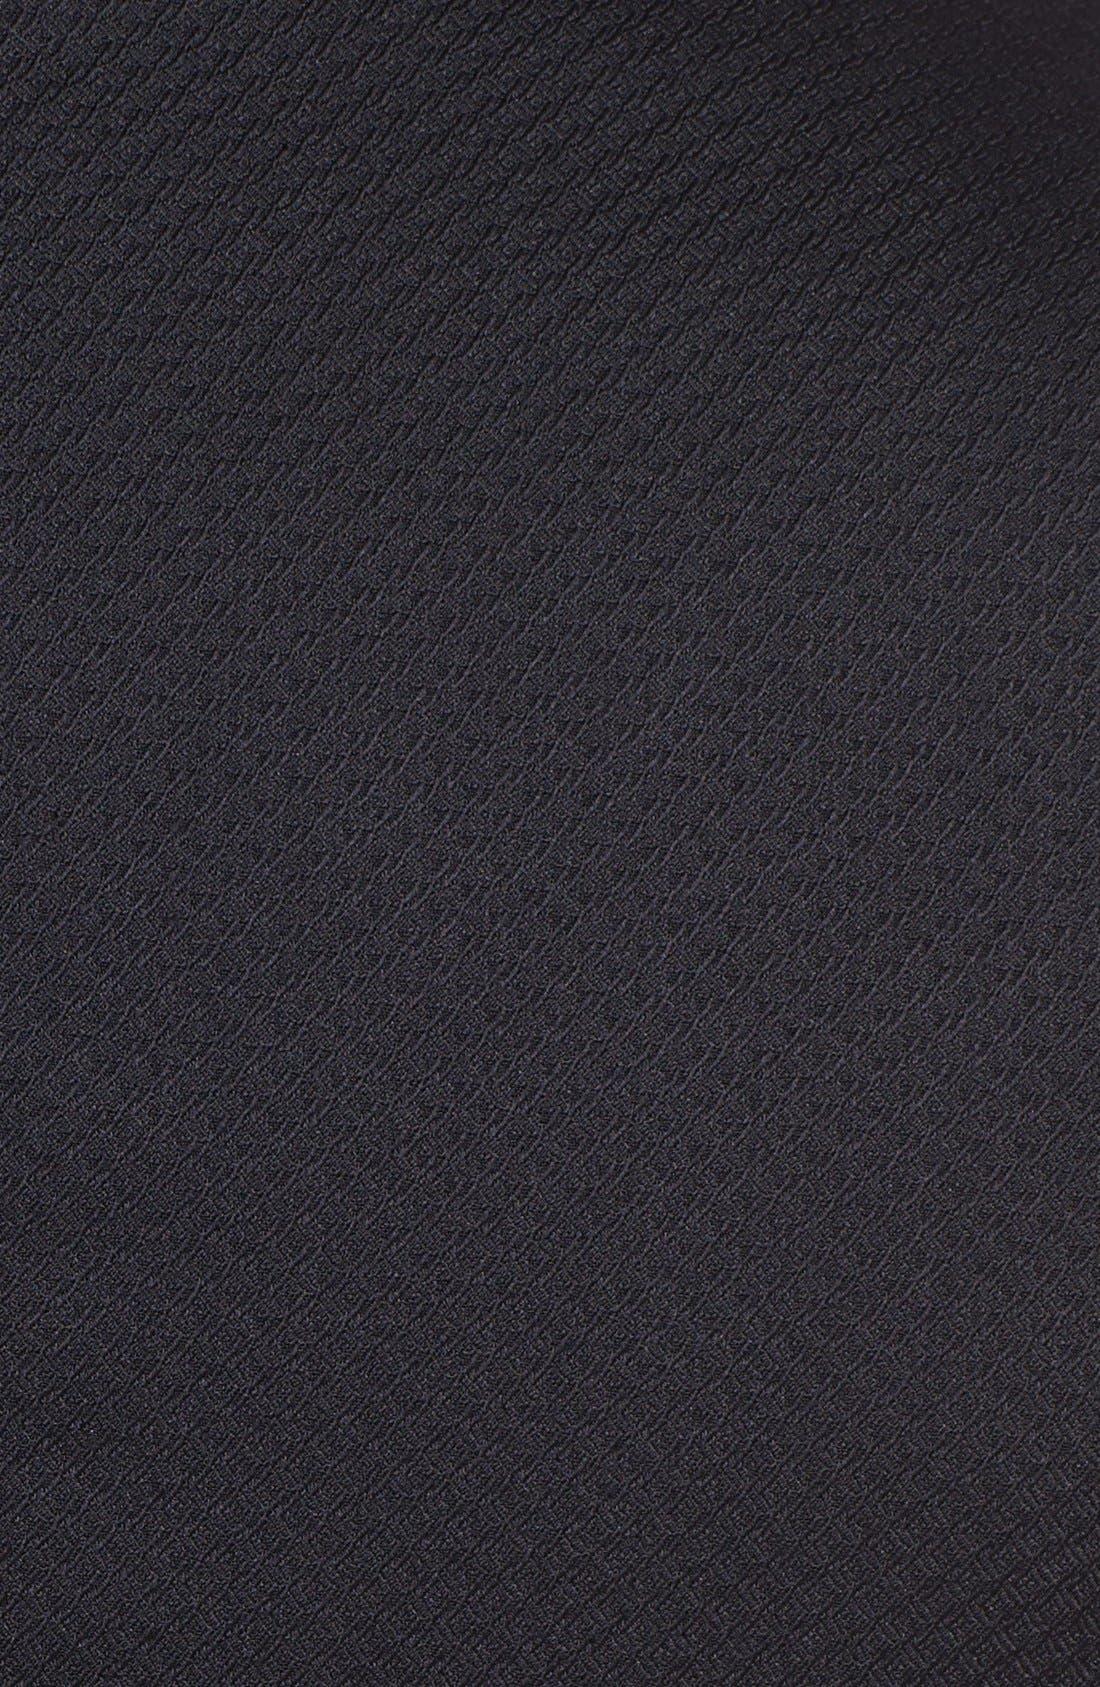 Alternate Image 3  - BOSS HUGO BOSS 'Daliva' Sheath Dress